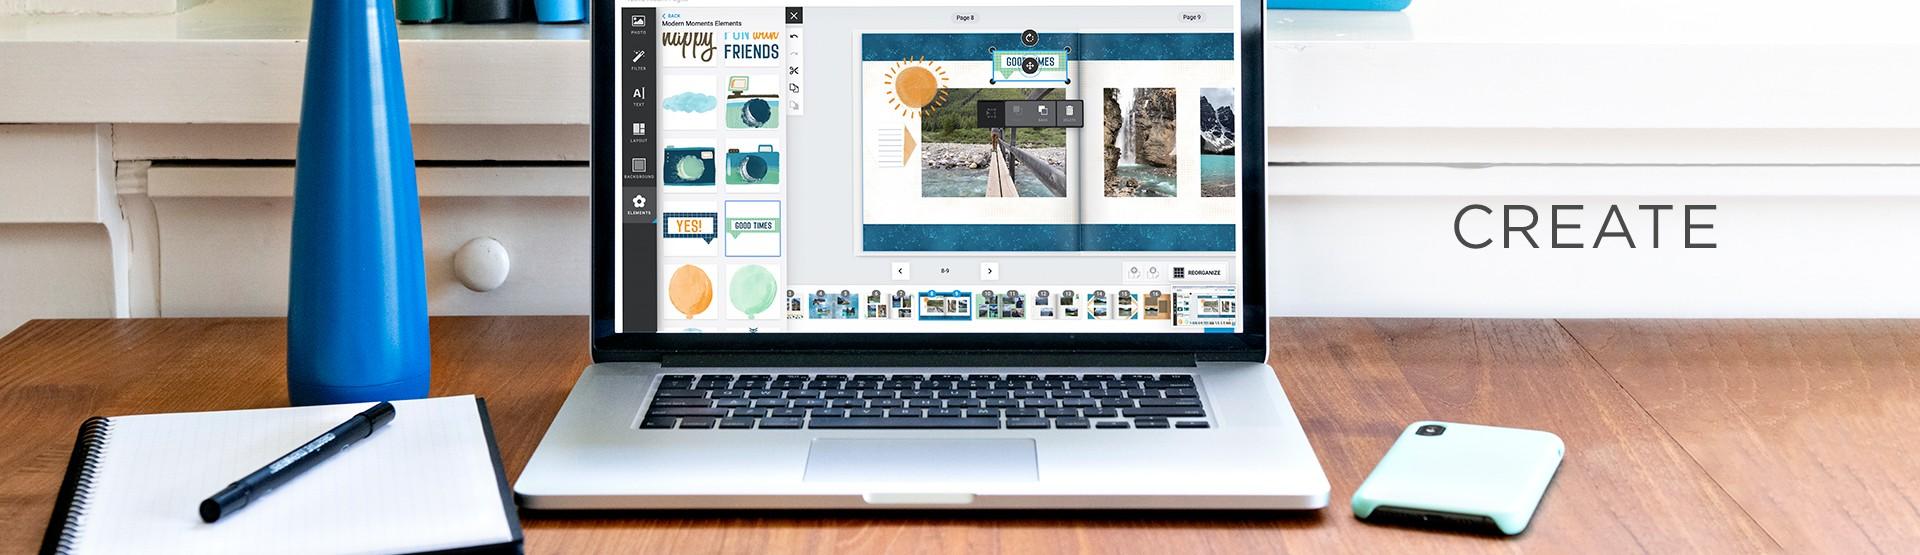 Create Digital Photo Albums